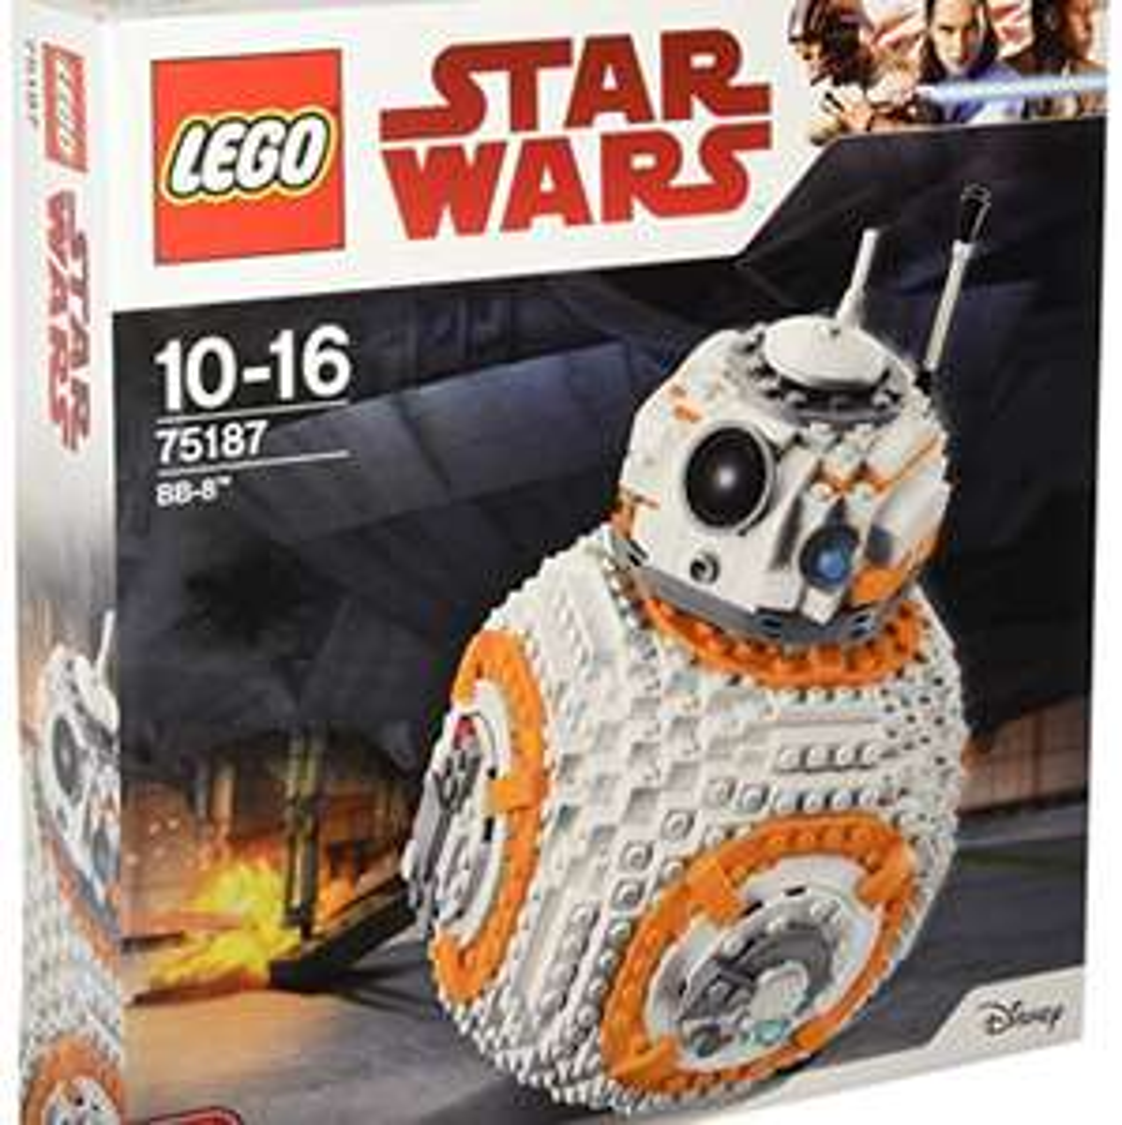 LEGO Star Wars BB8 £59.99 @ Amazon